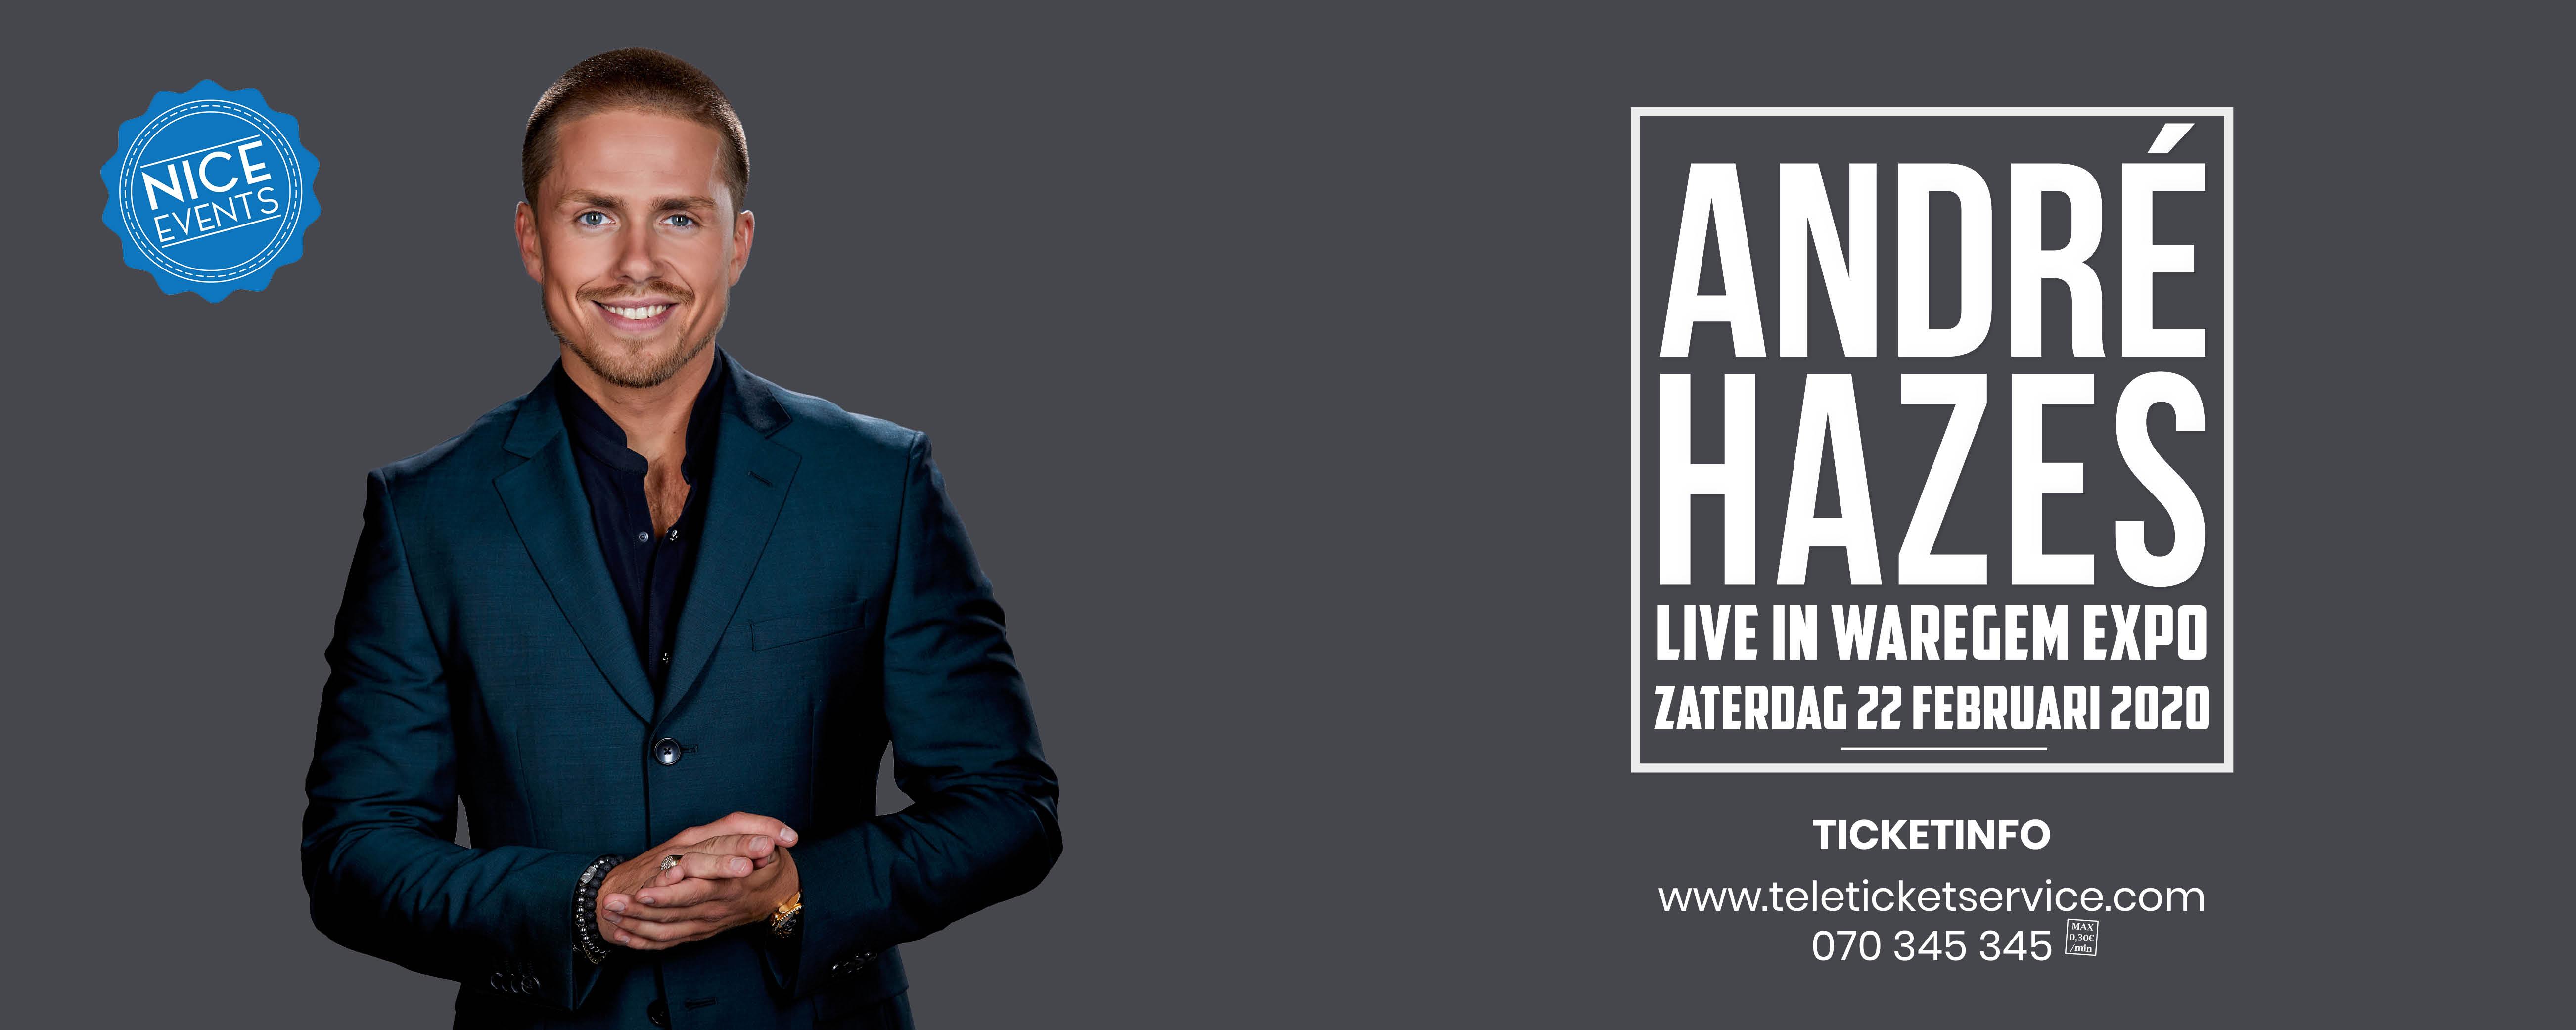 André Hazes live in concert